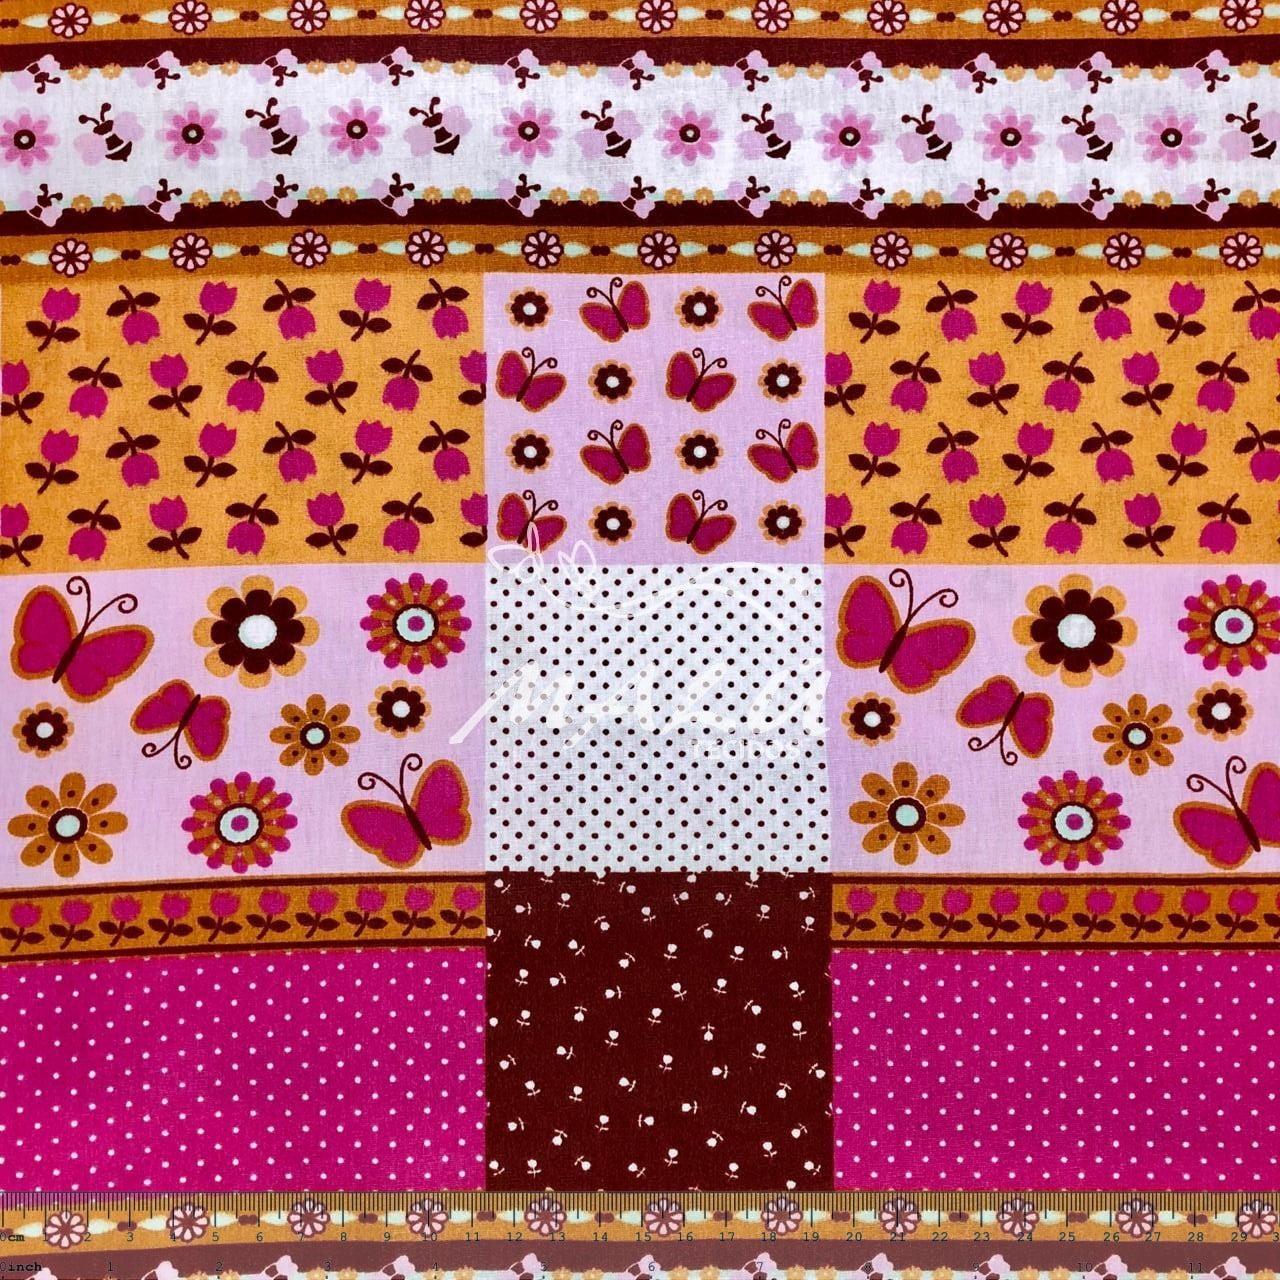 Tricoline Patchwork Floral com Borboletas 31cm